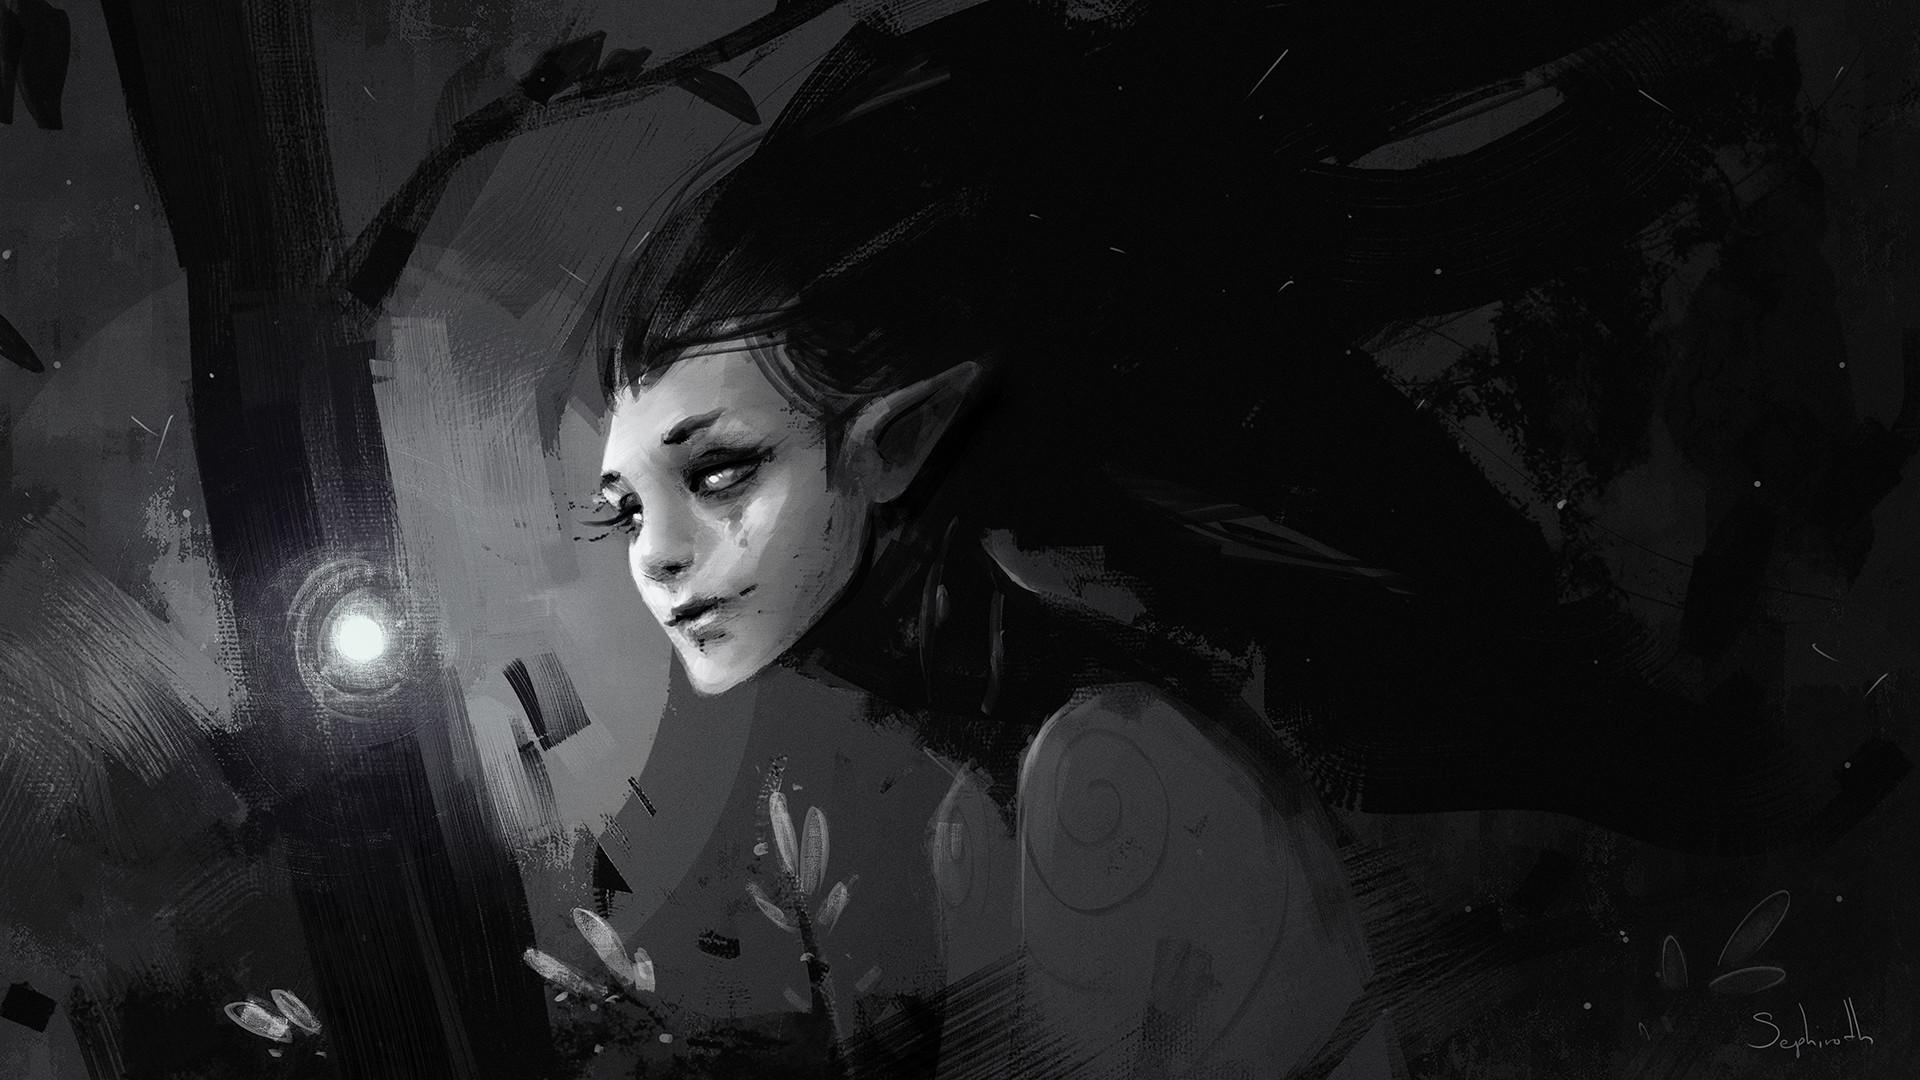 Sephiroth art kalm